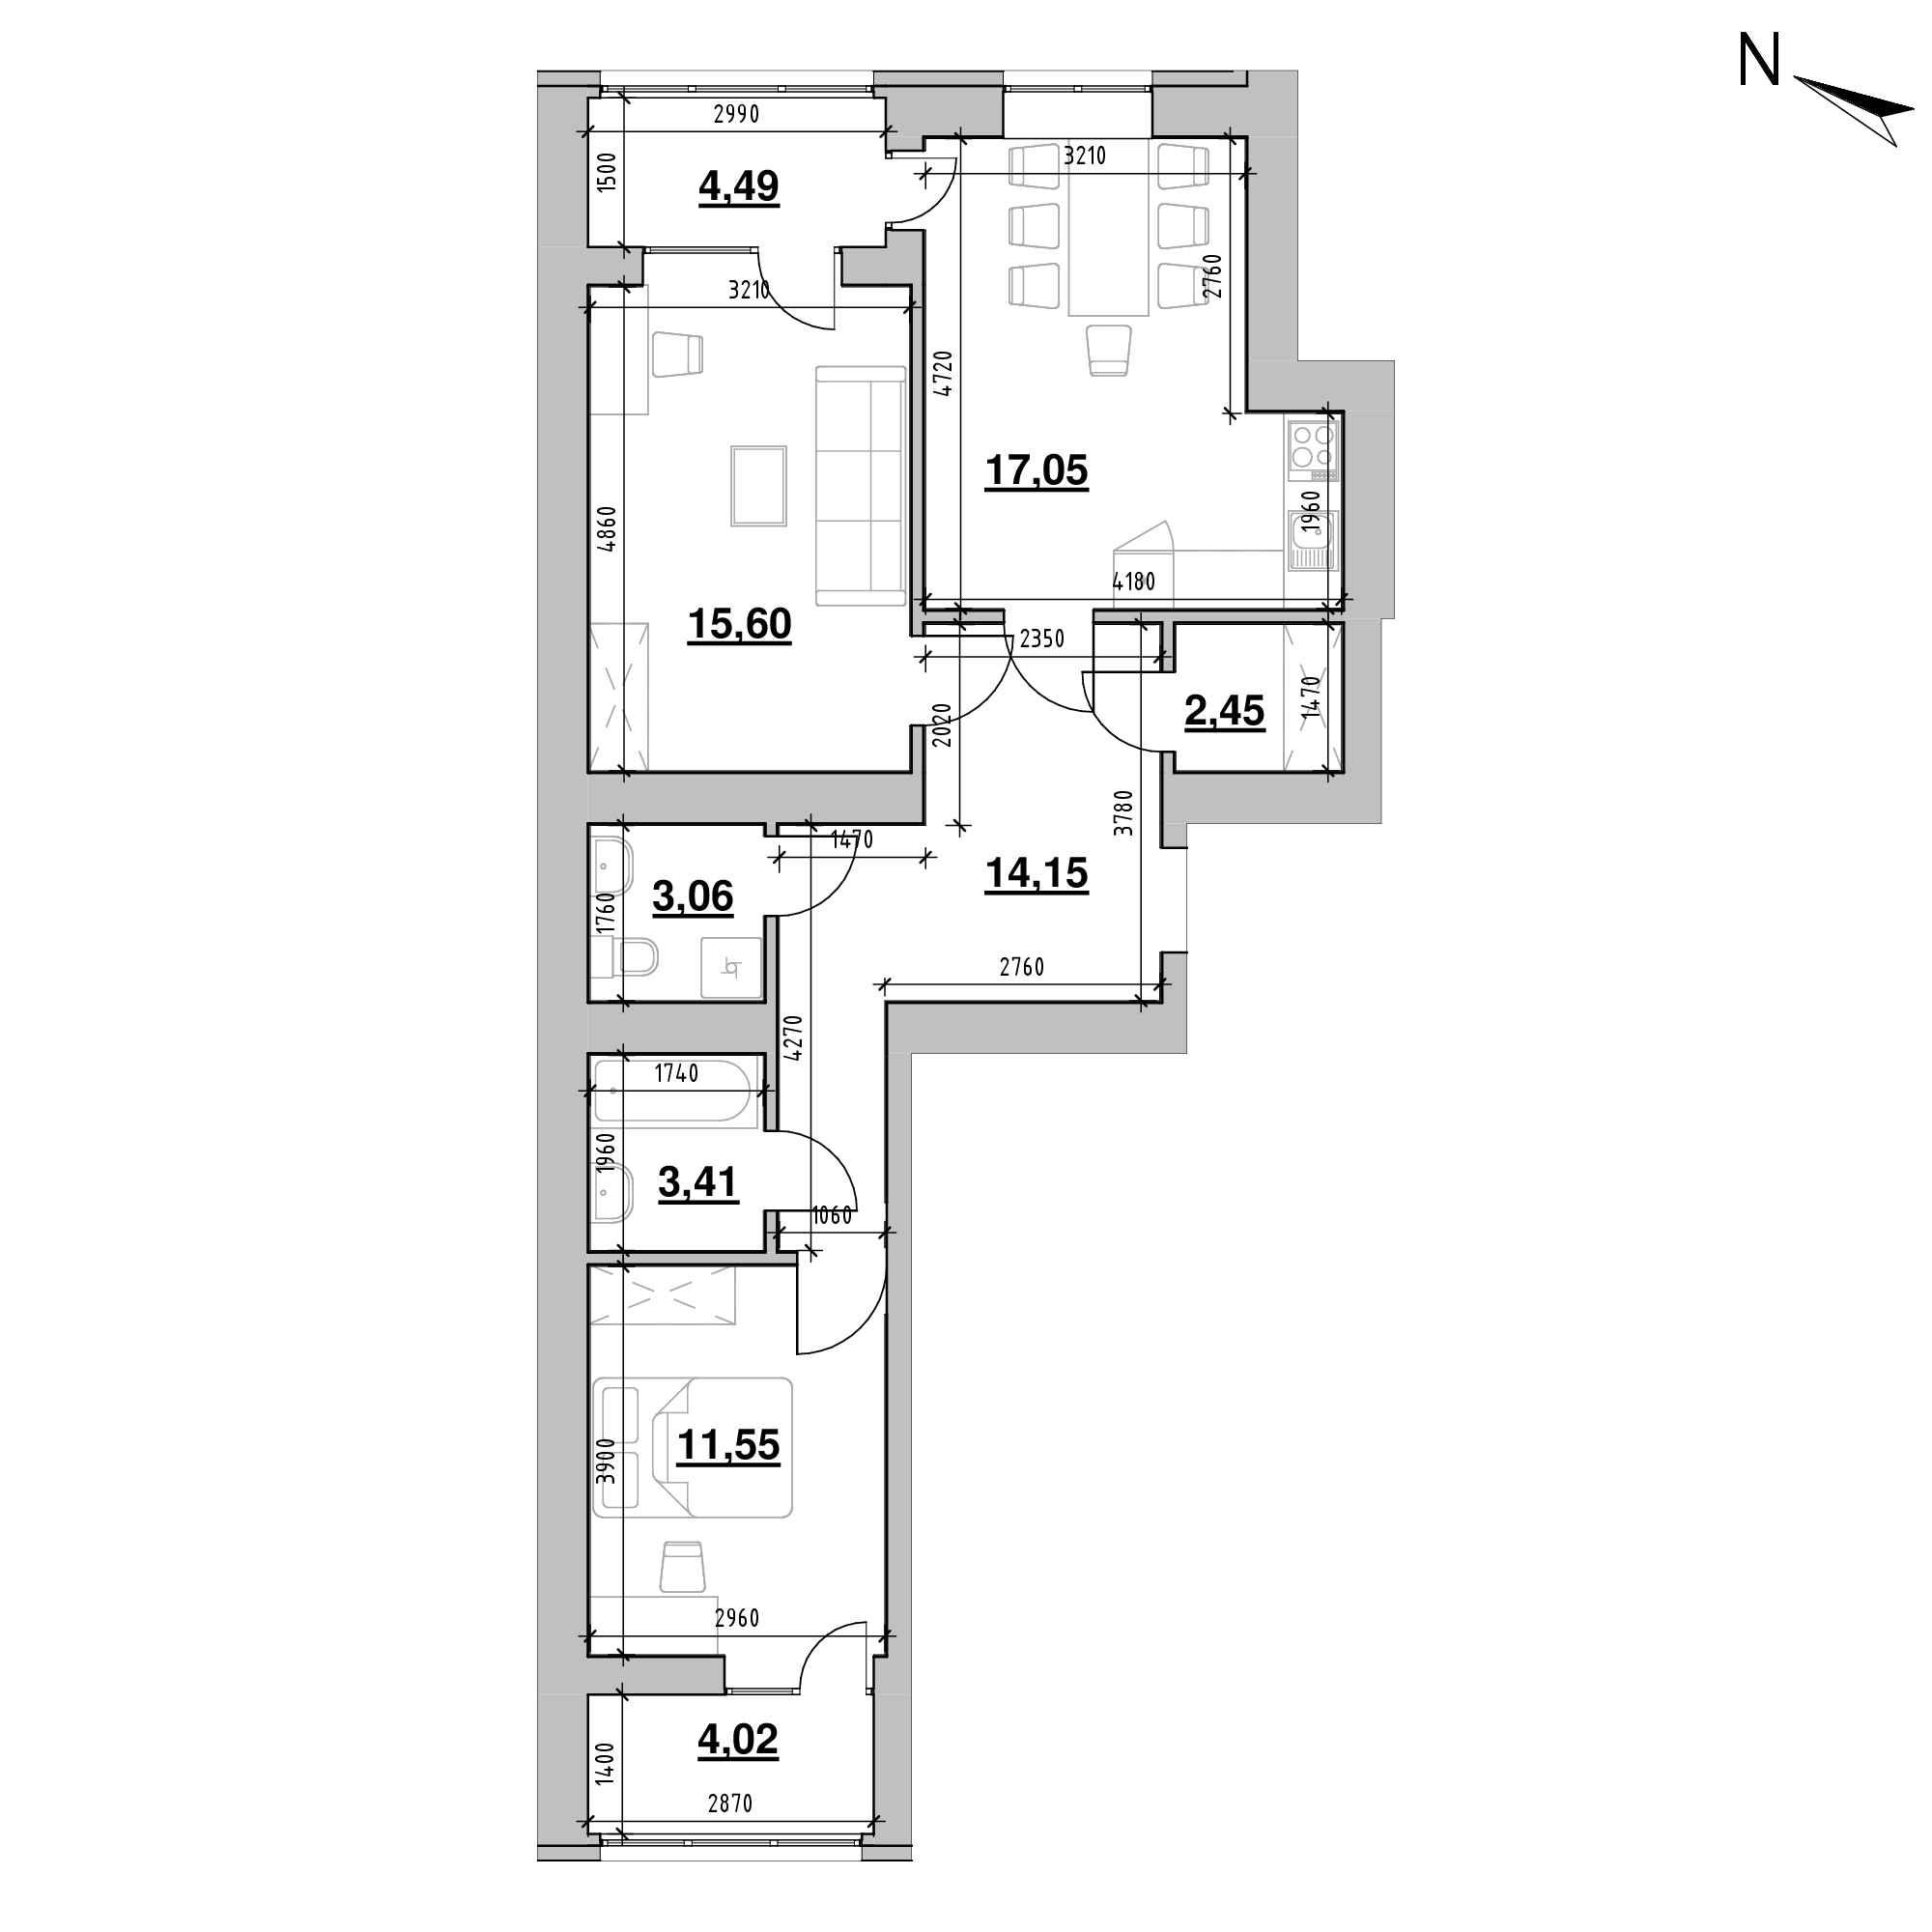 ЖК Шенген: планування 2-кімнатної квартири, №18, 75.78 м<sup>2</sup>